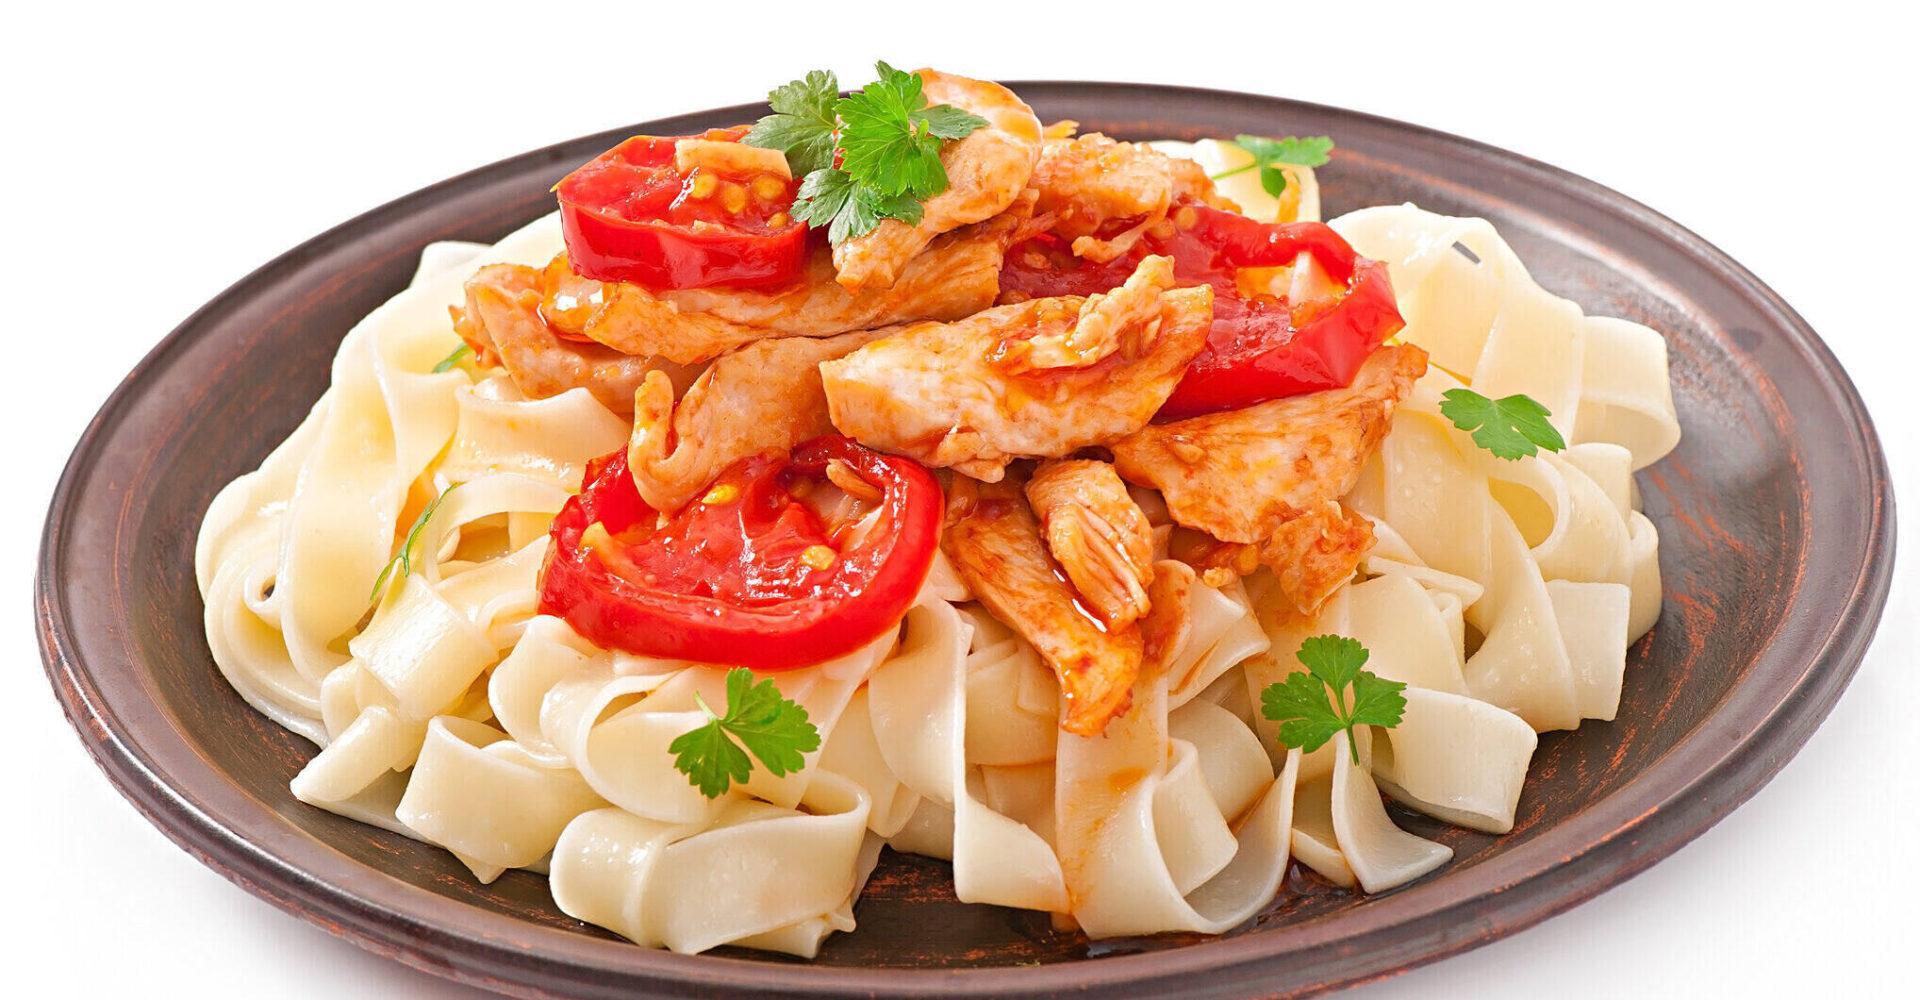 Chicken and ham linguine pasta